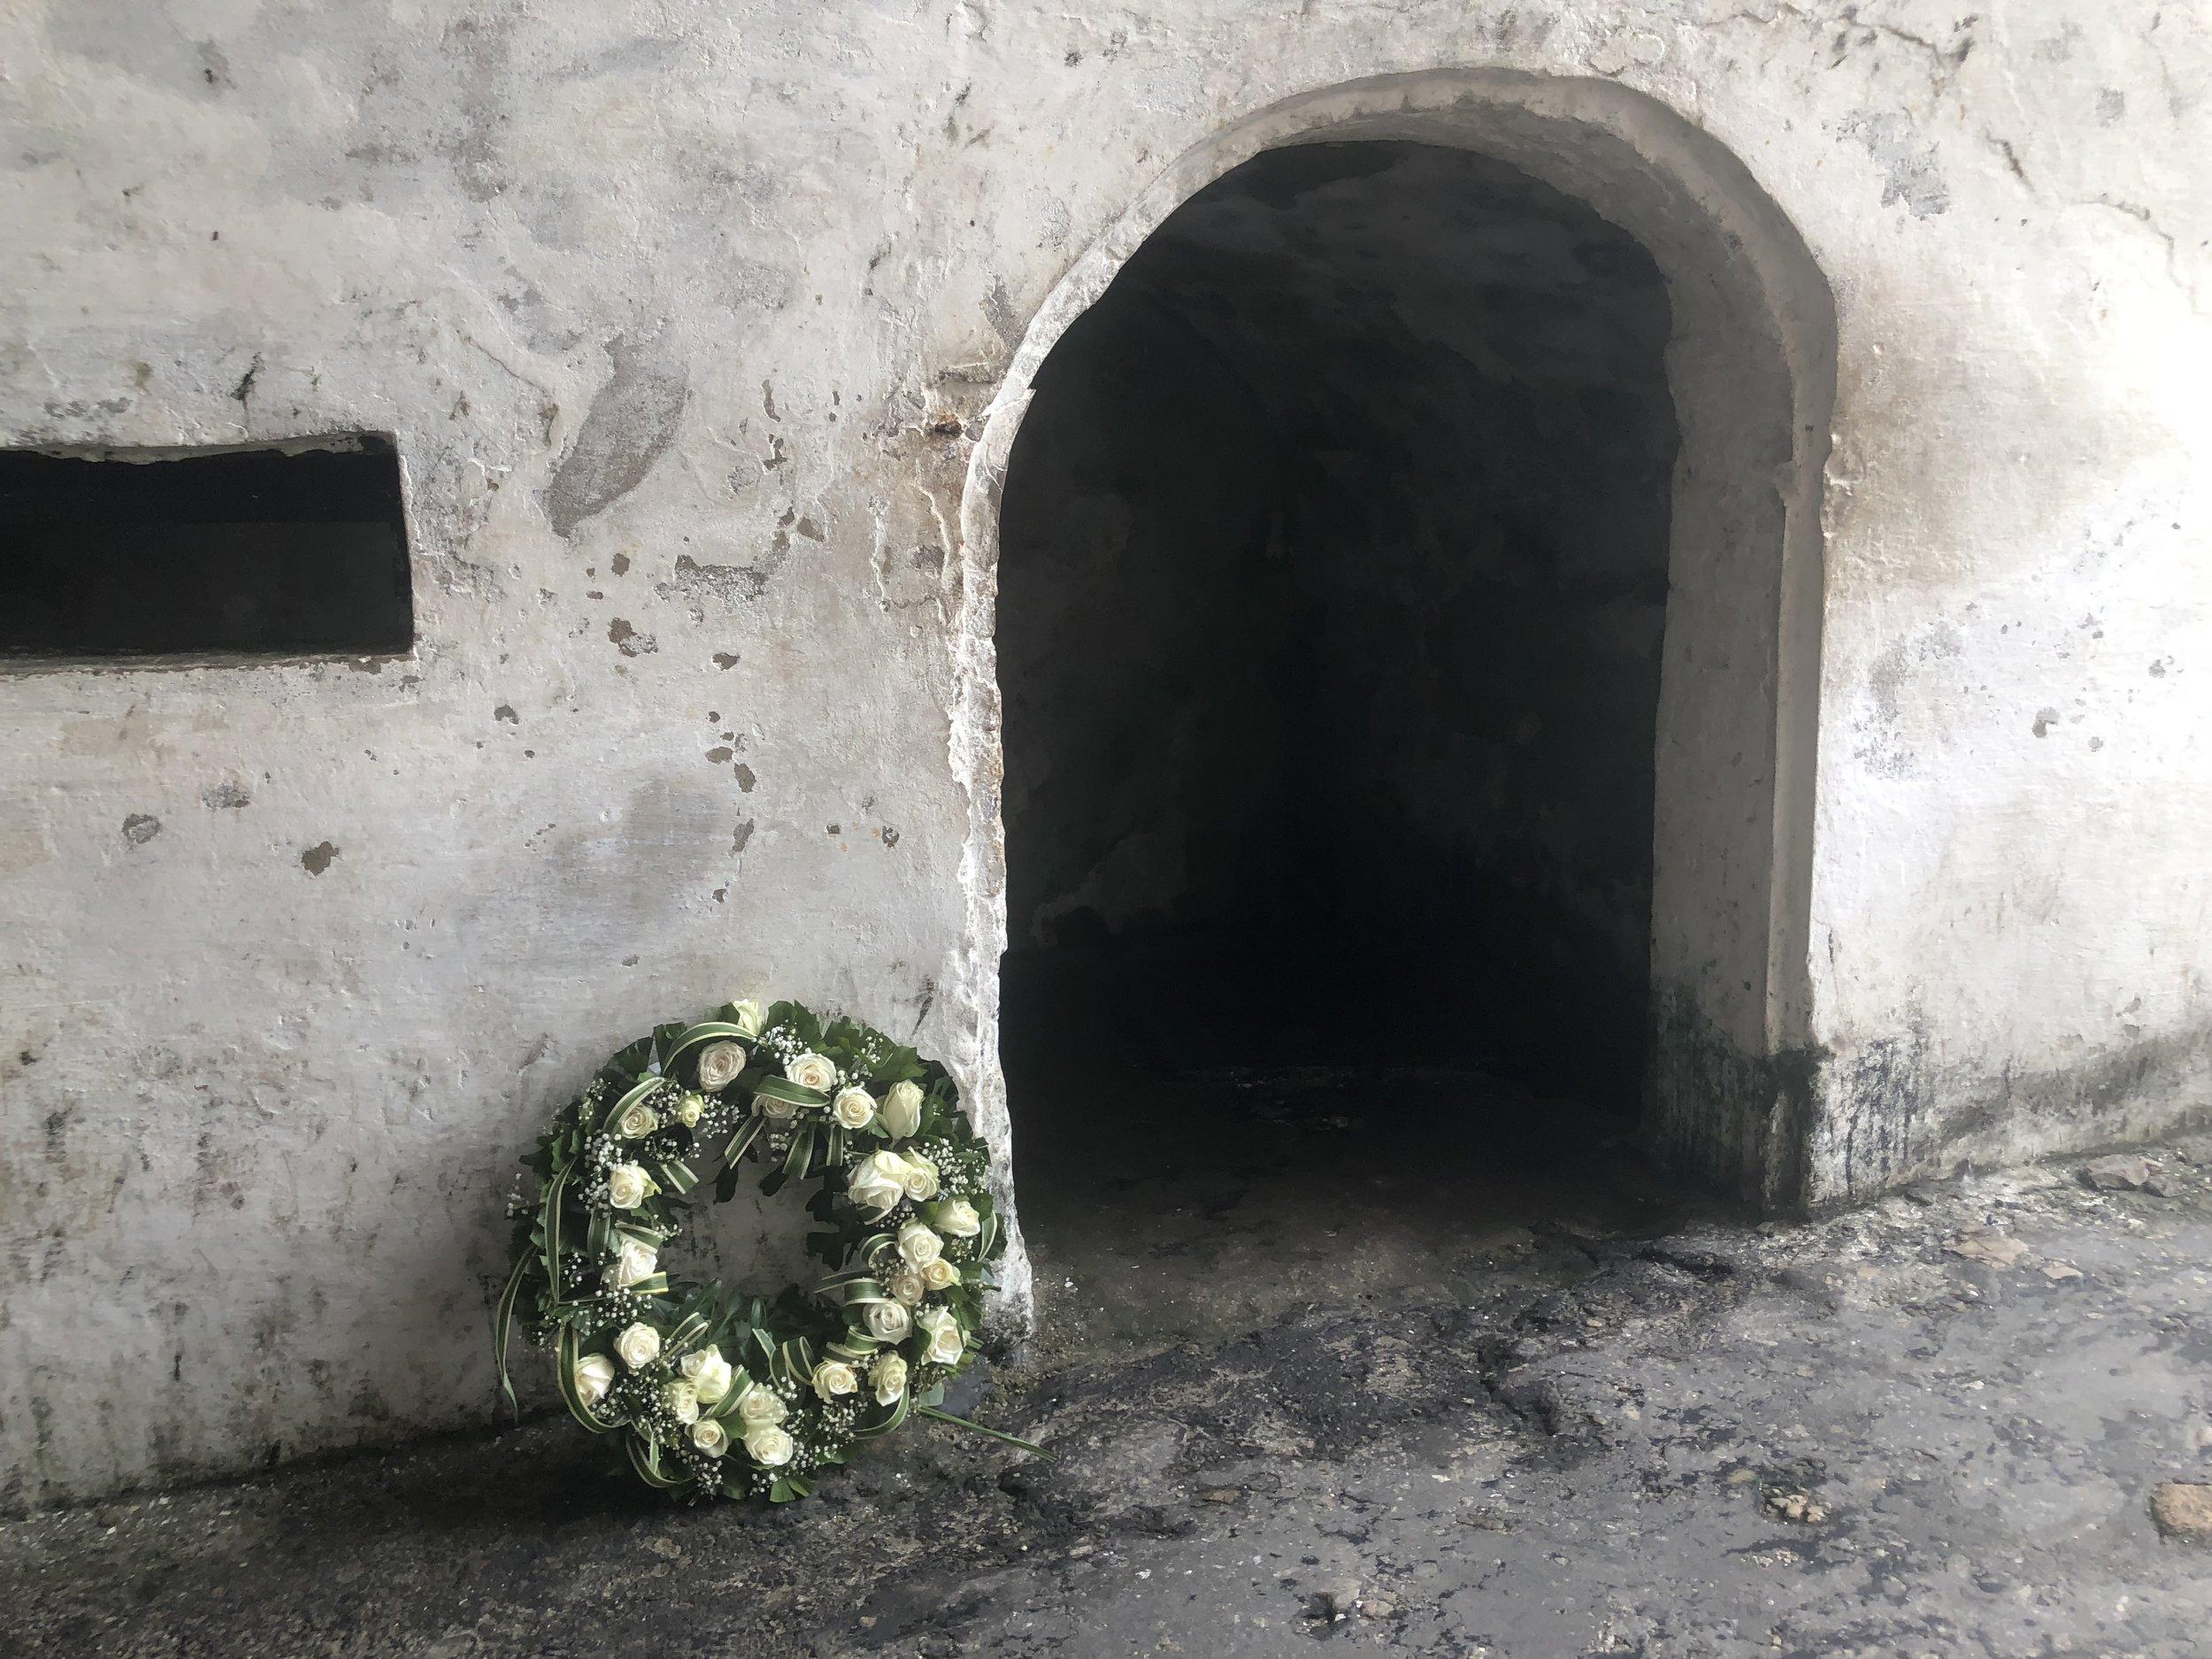 Melania Trump's wreath